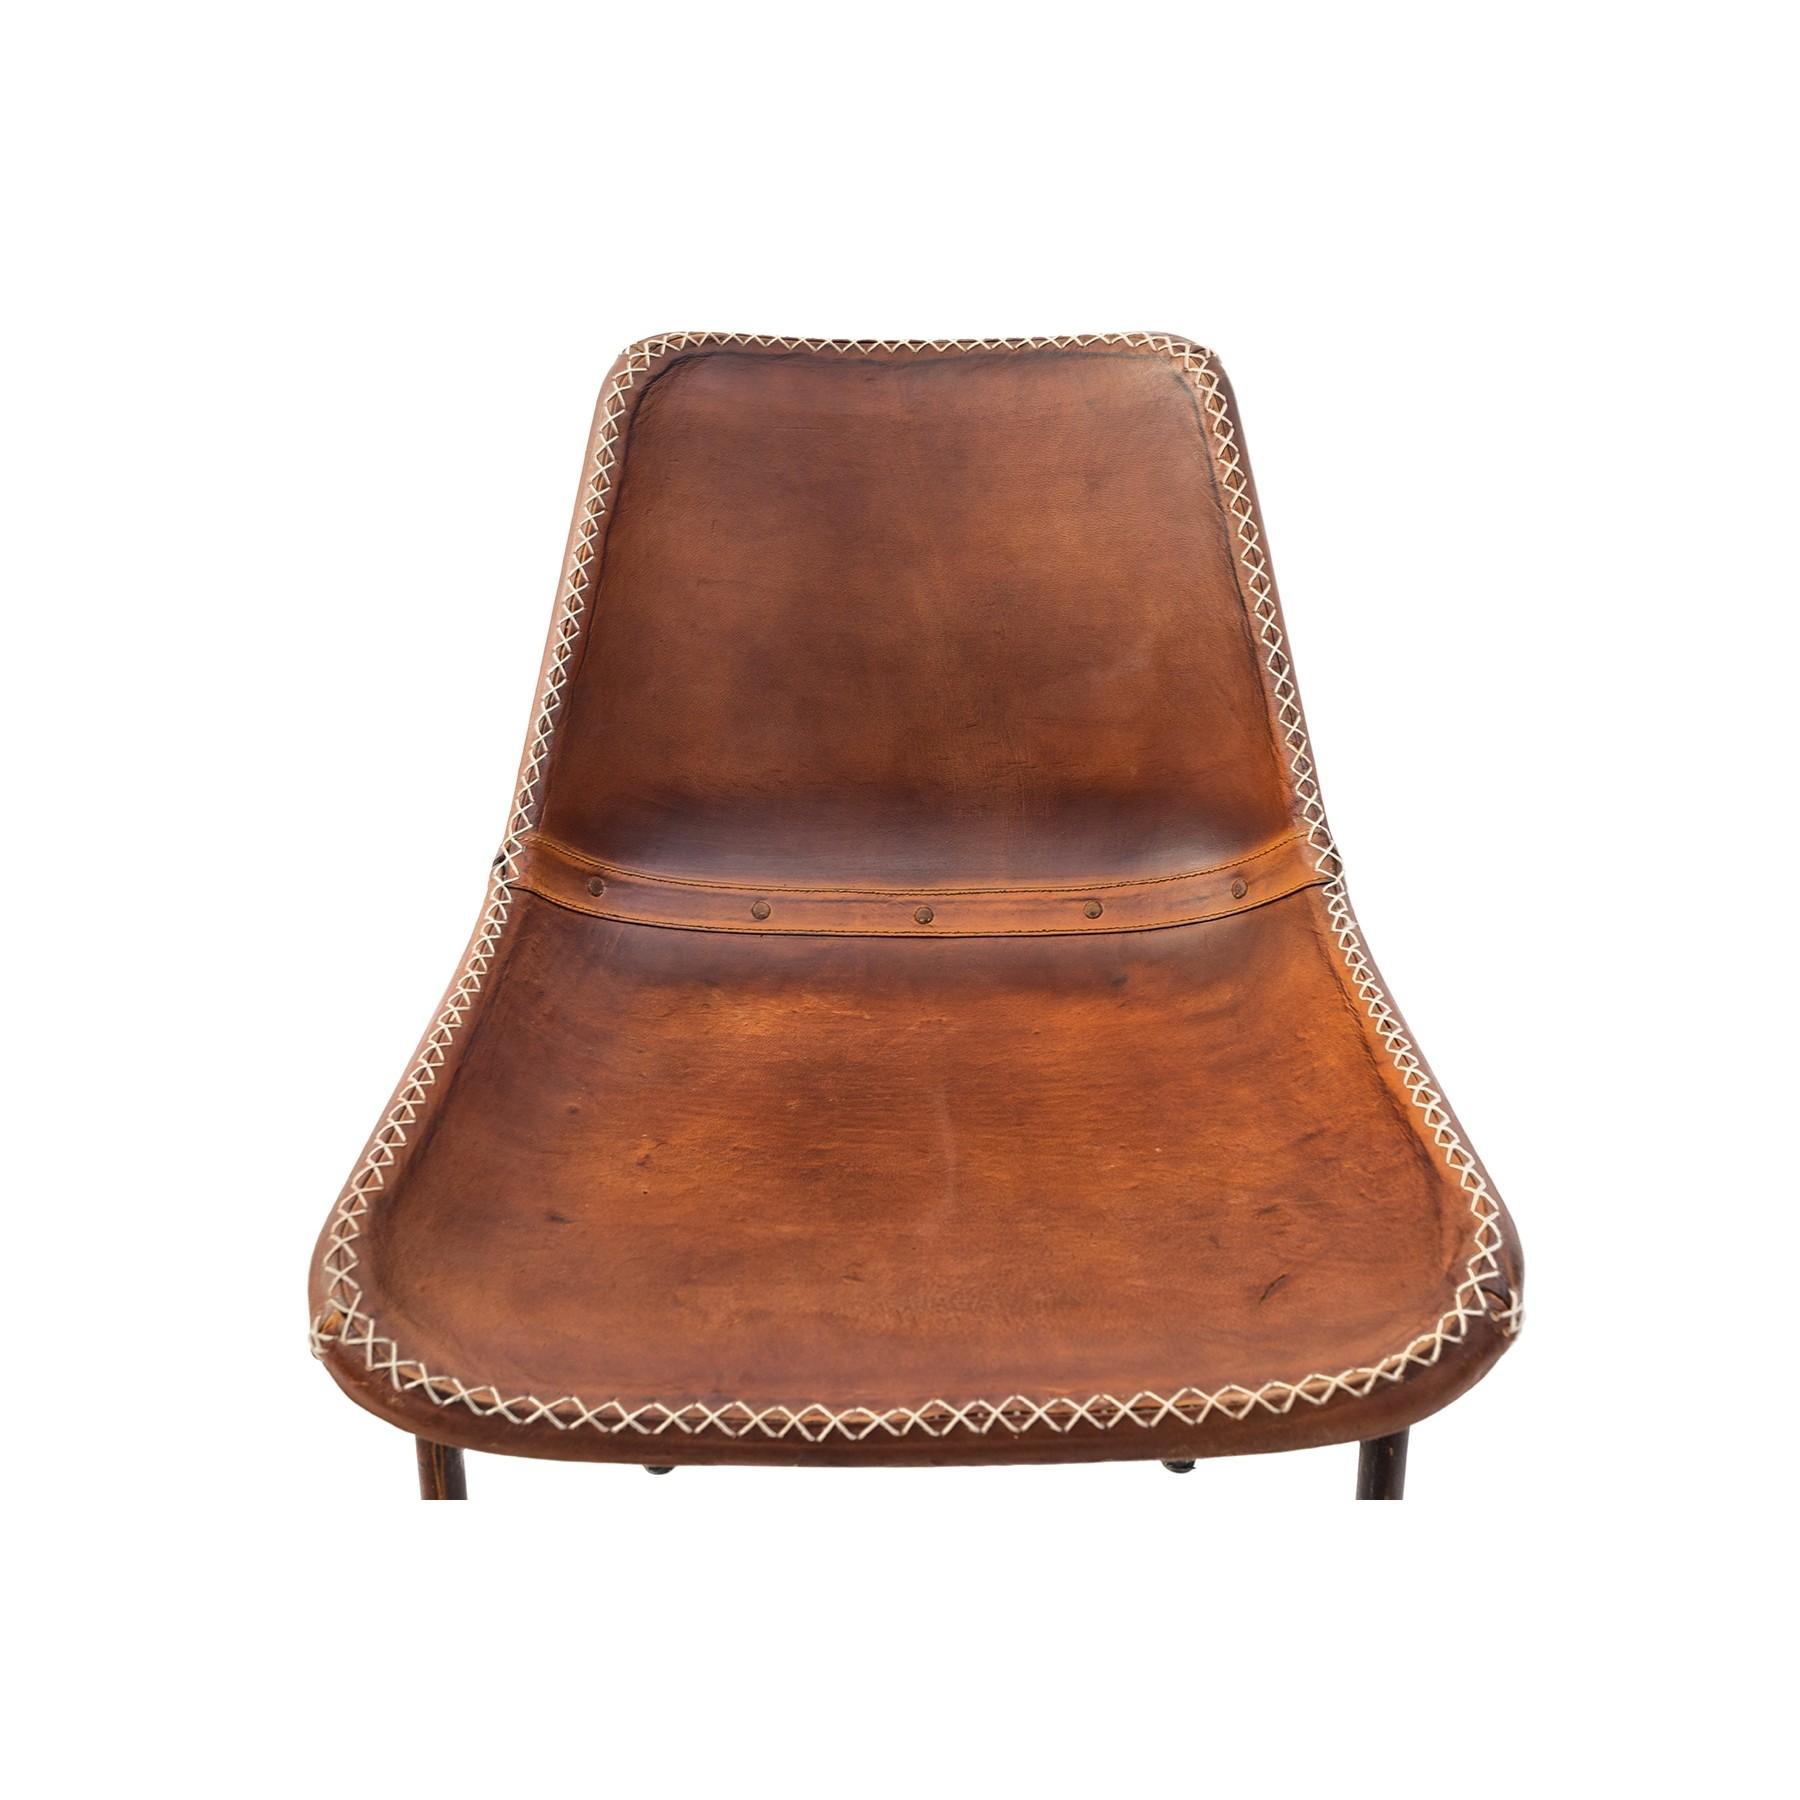 Pin silla de comedor gimlet mobles 114 ociohogarcom on for Sillas de comedor de cuero